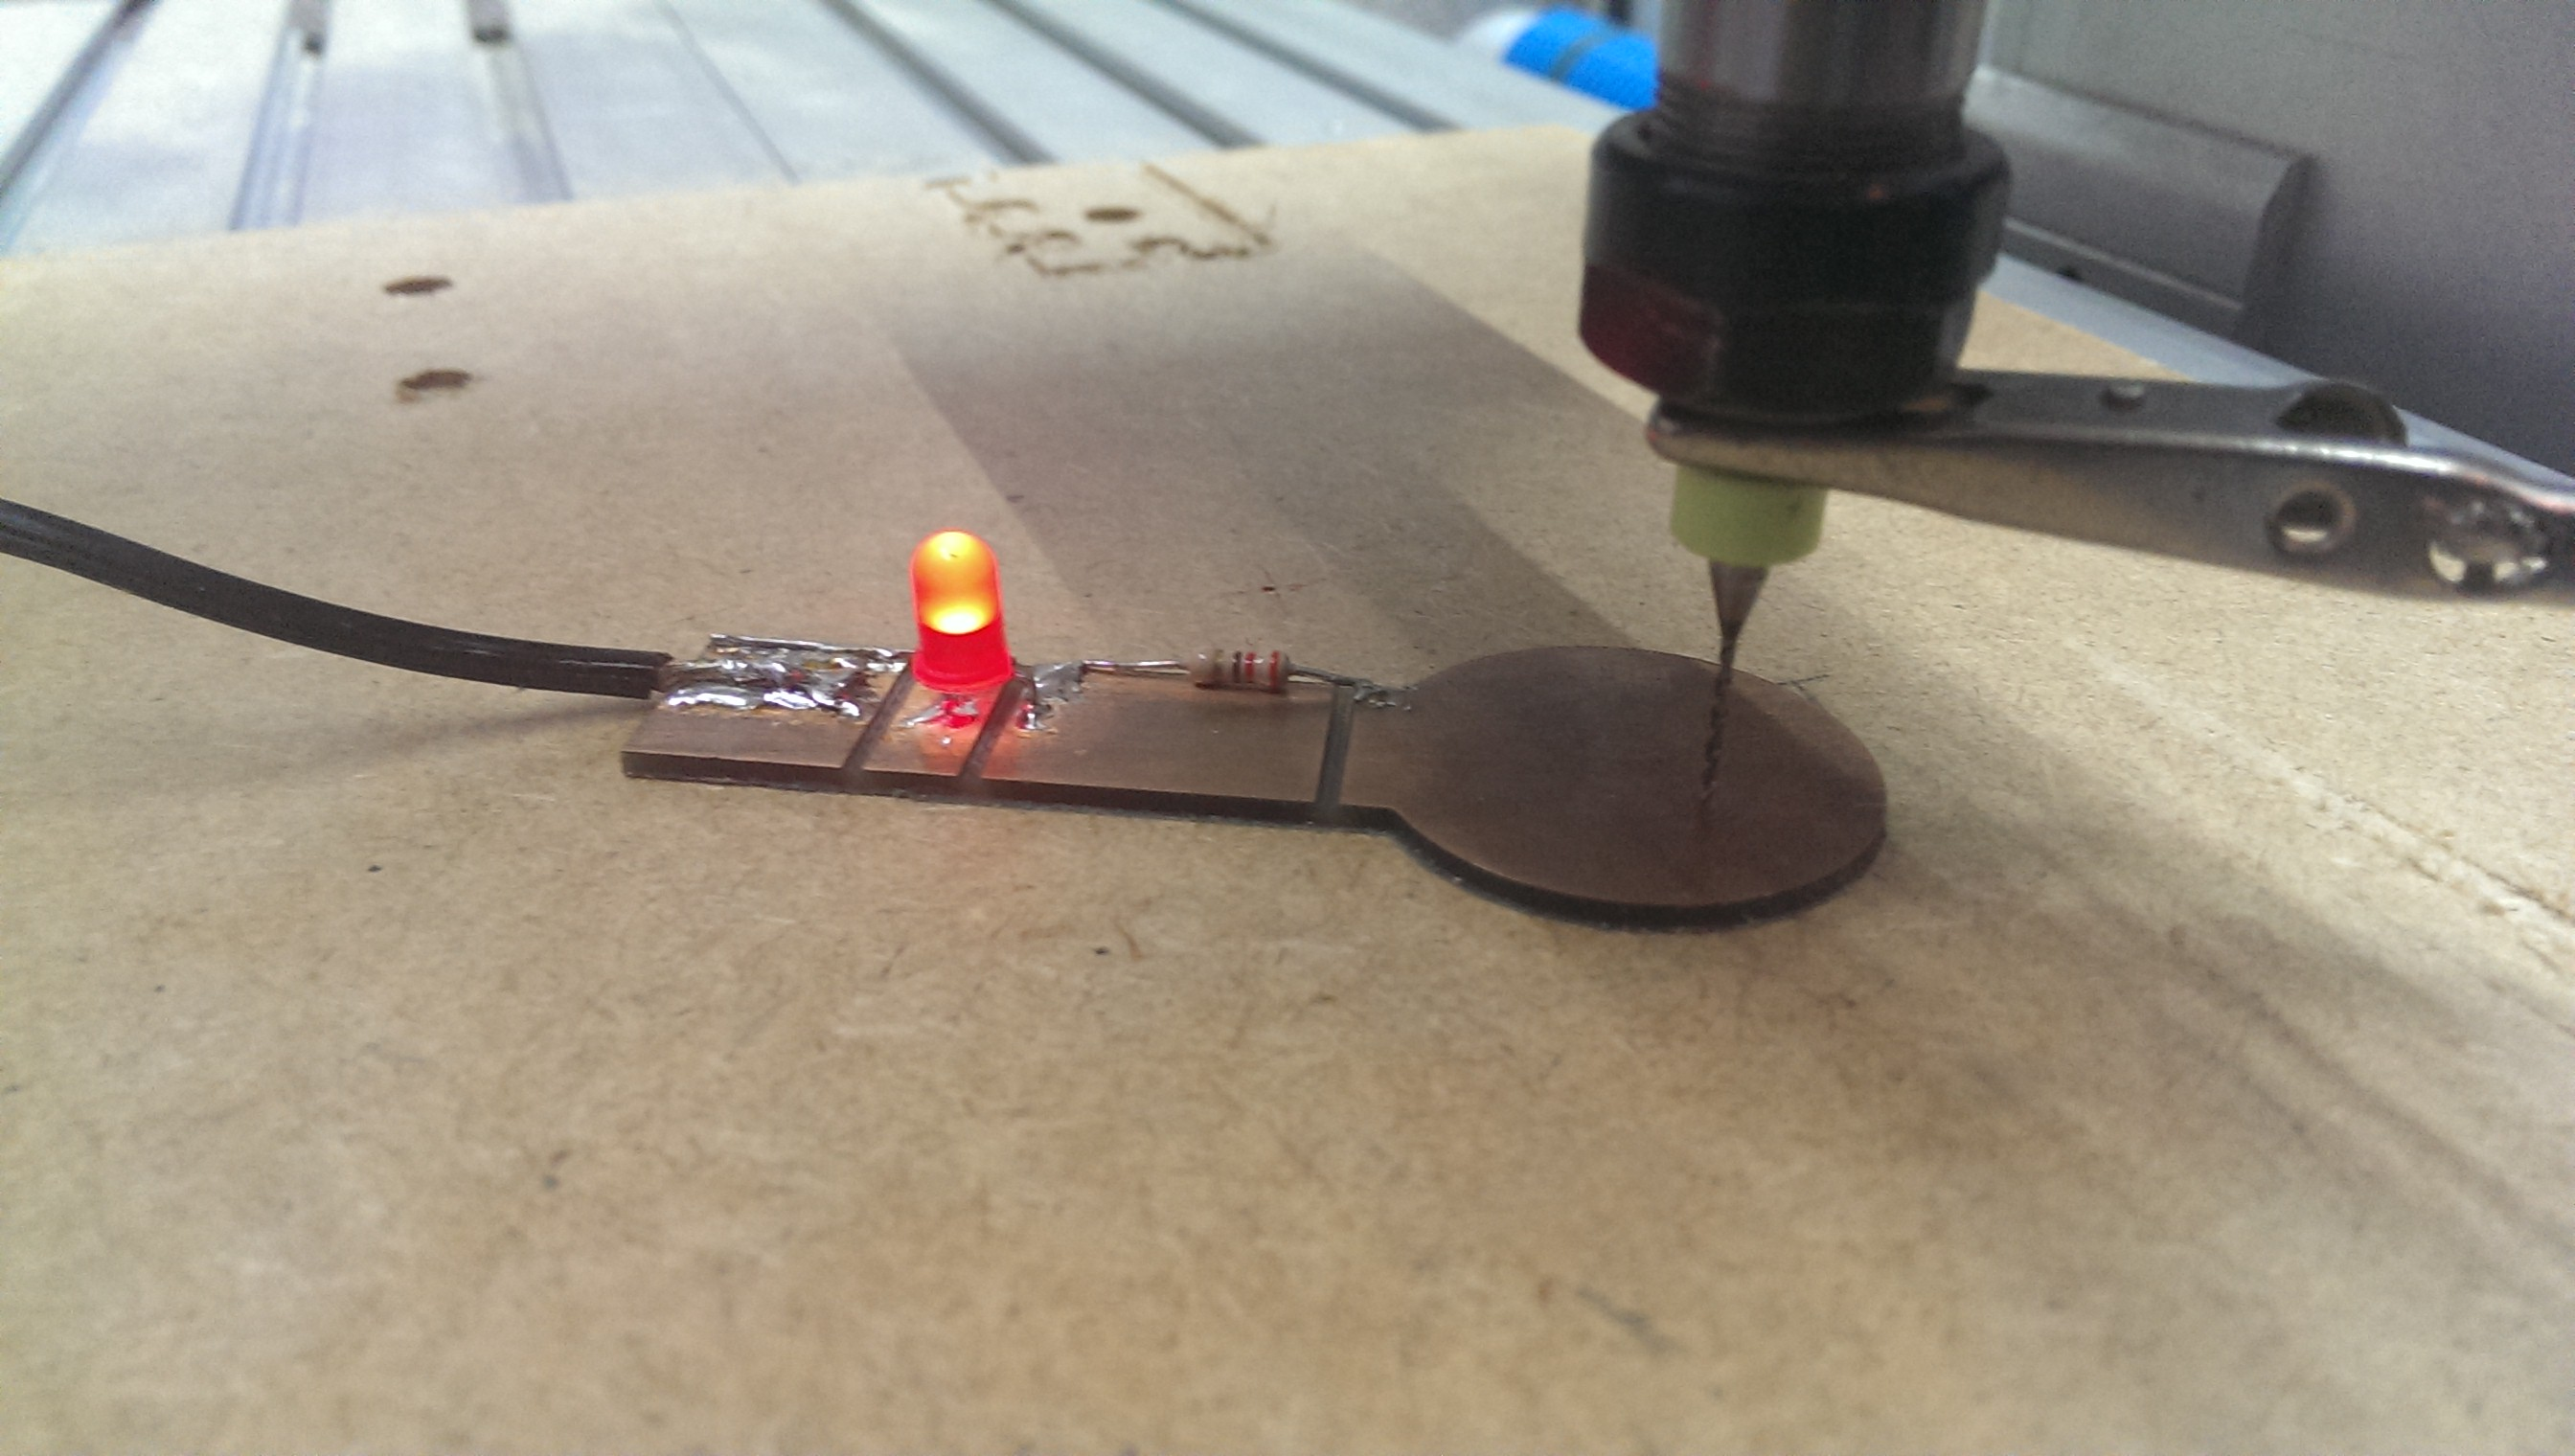 Picture of Mach3 Zero Probe Tool